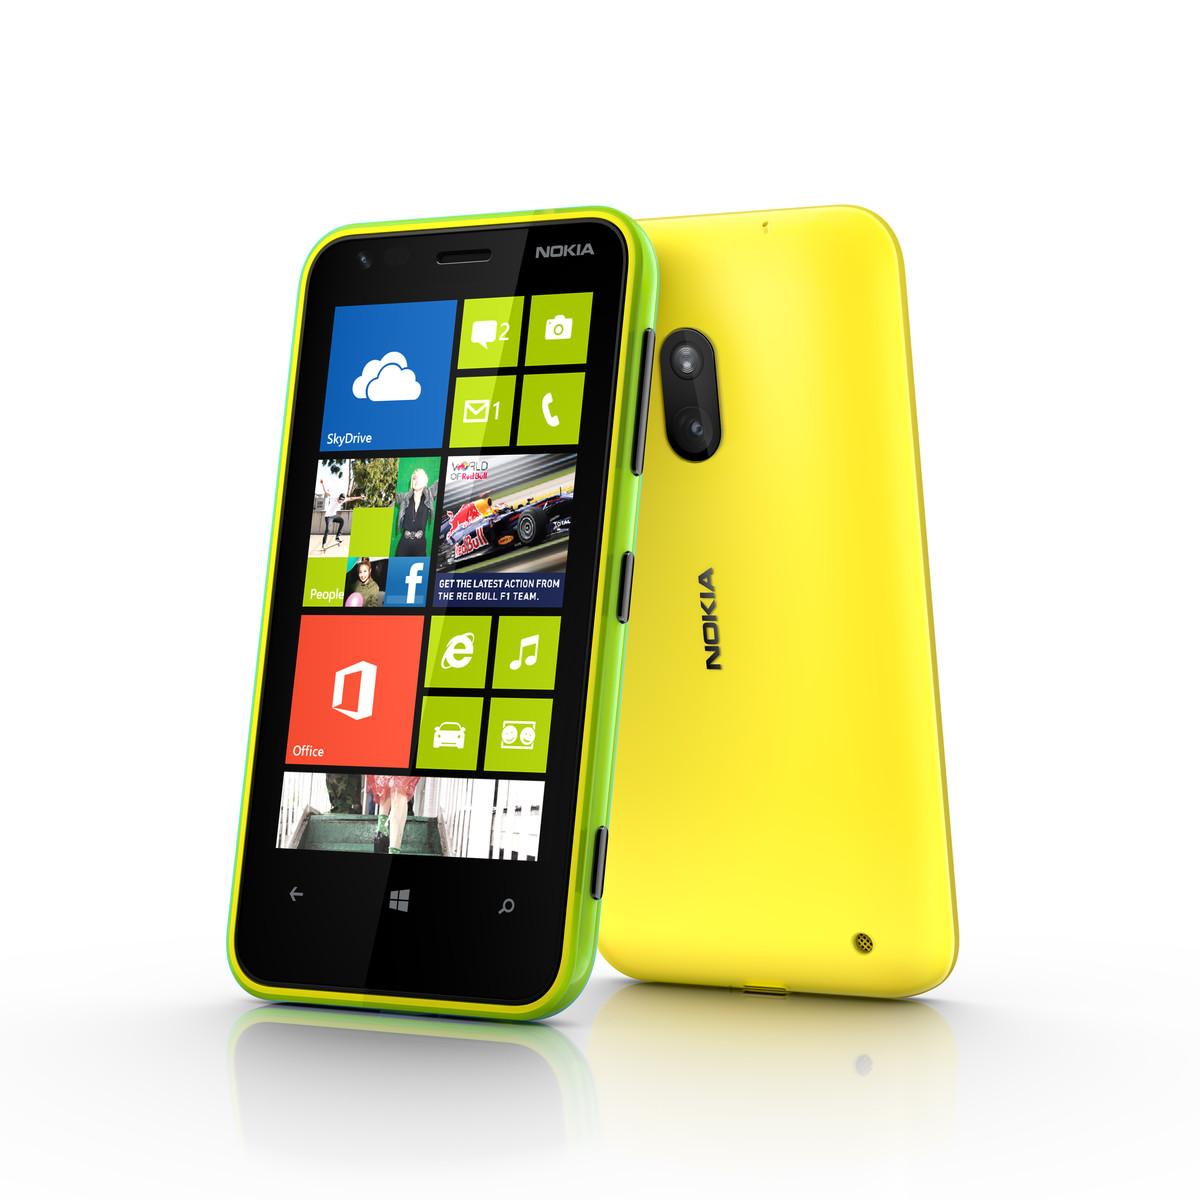 Nokia Lumia Backgrounds on Wallpapers Vista